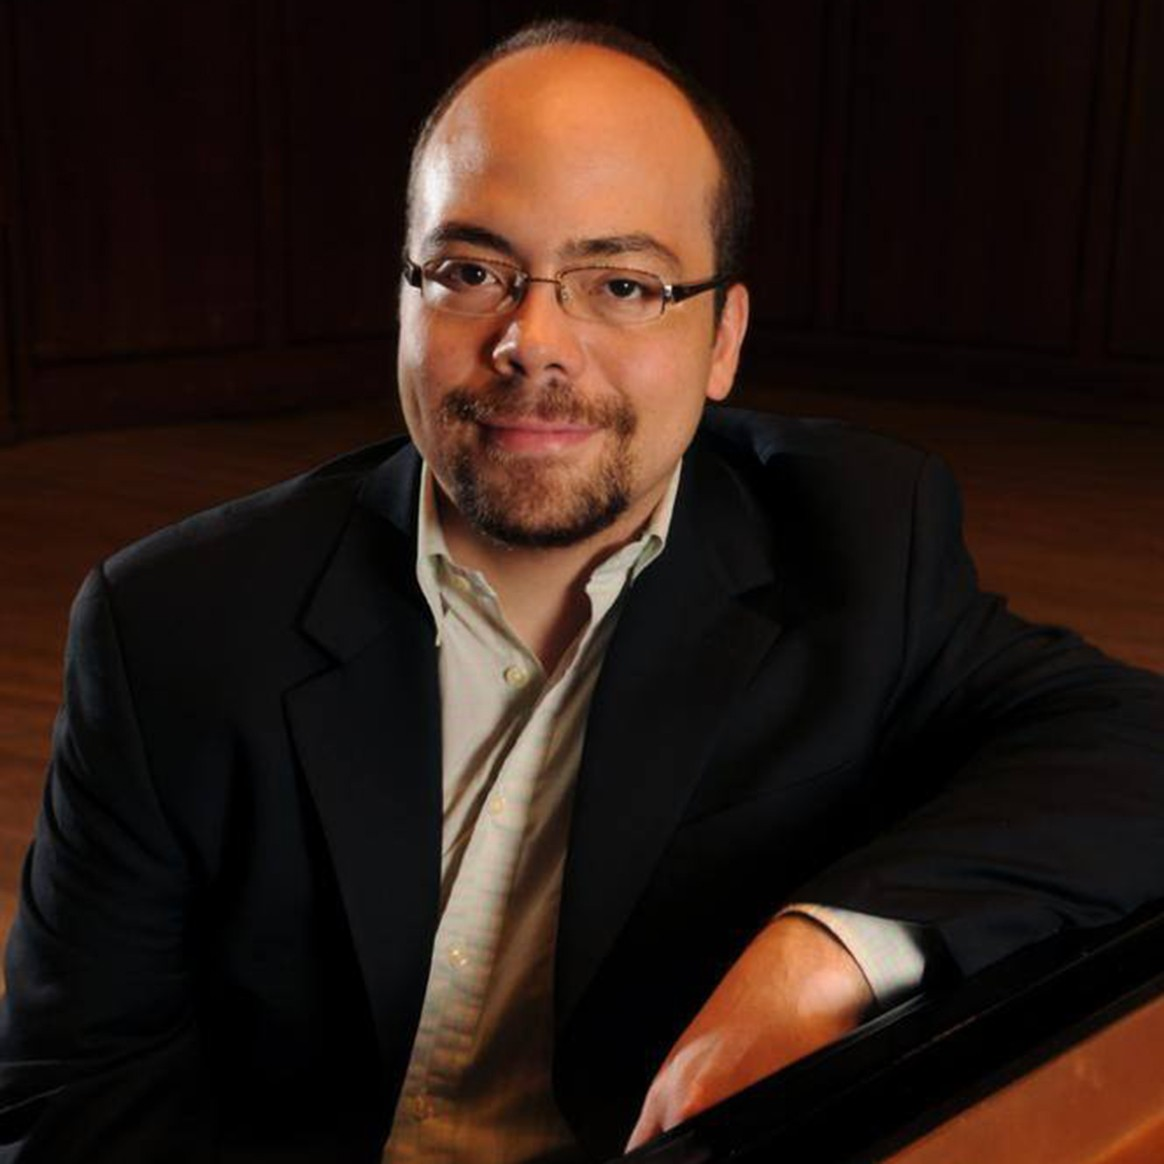 Headshot of Penn State Associate Professor of Piano Christopher Guzman